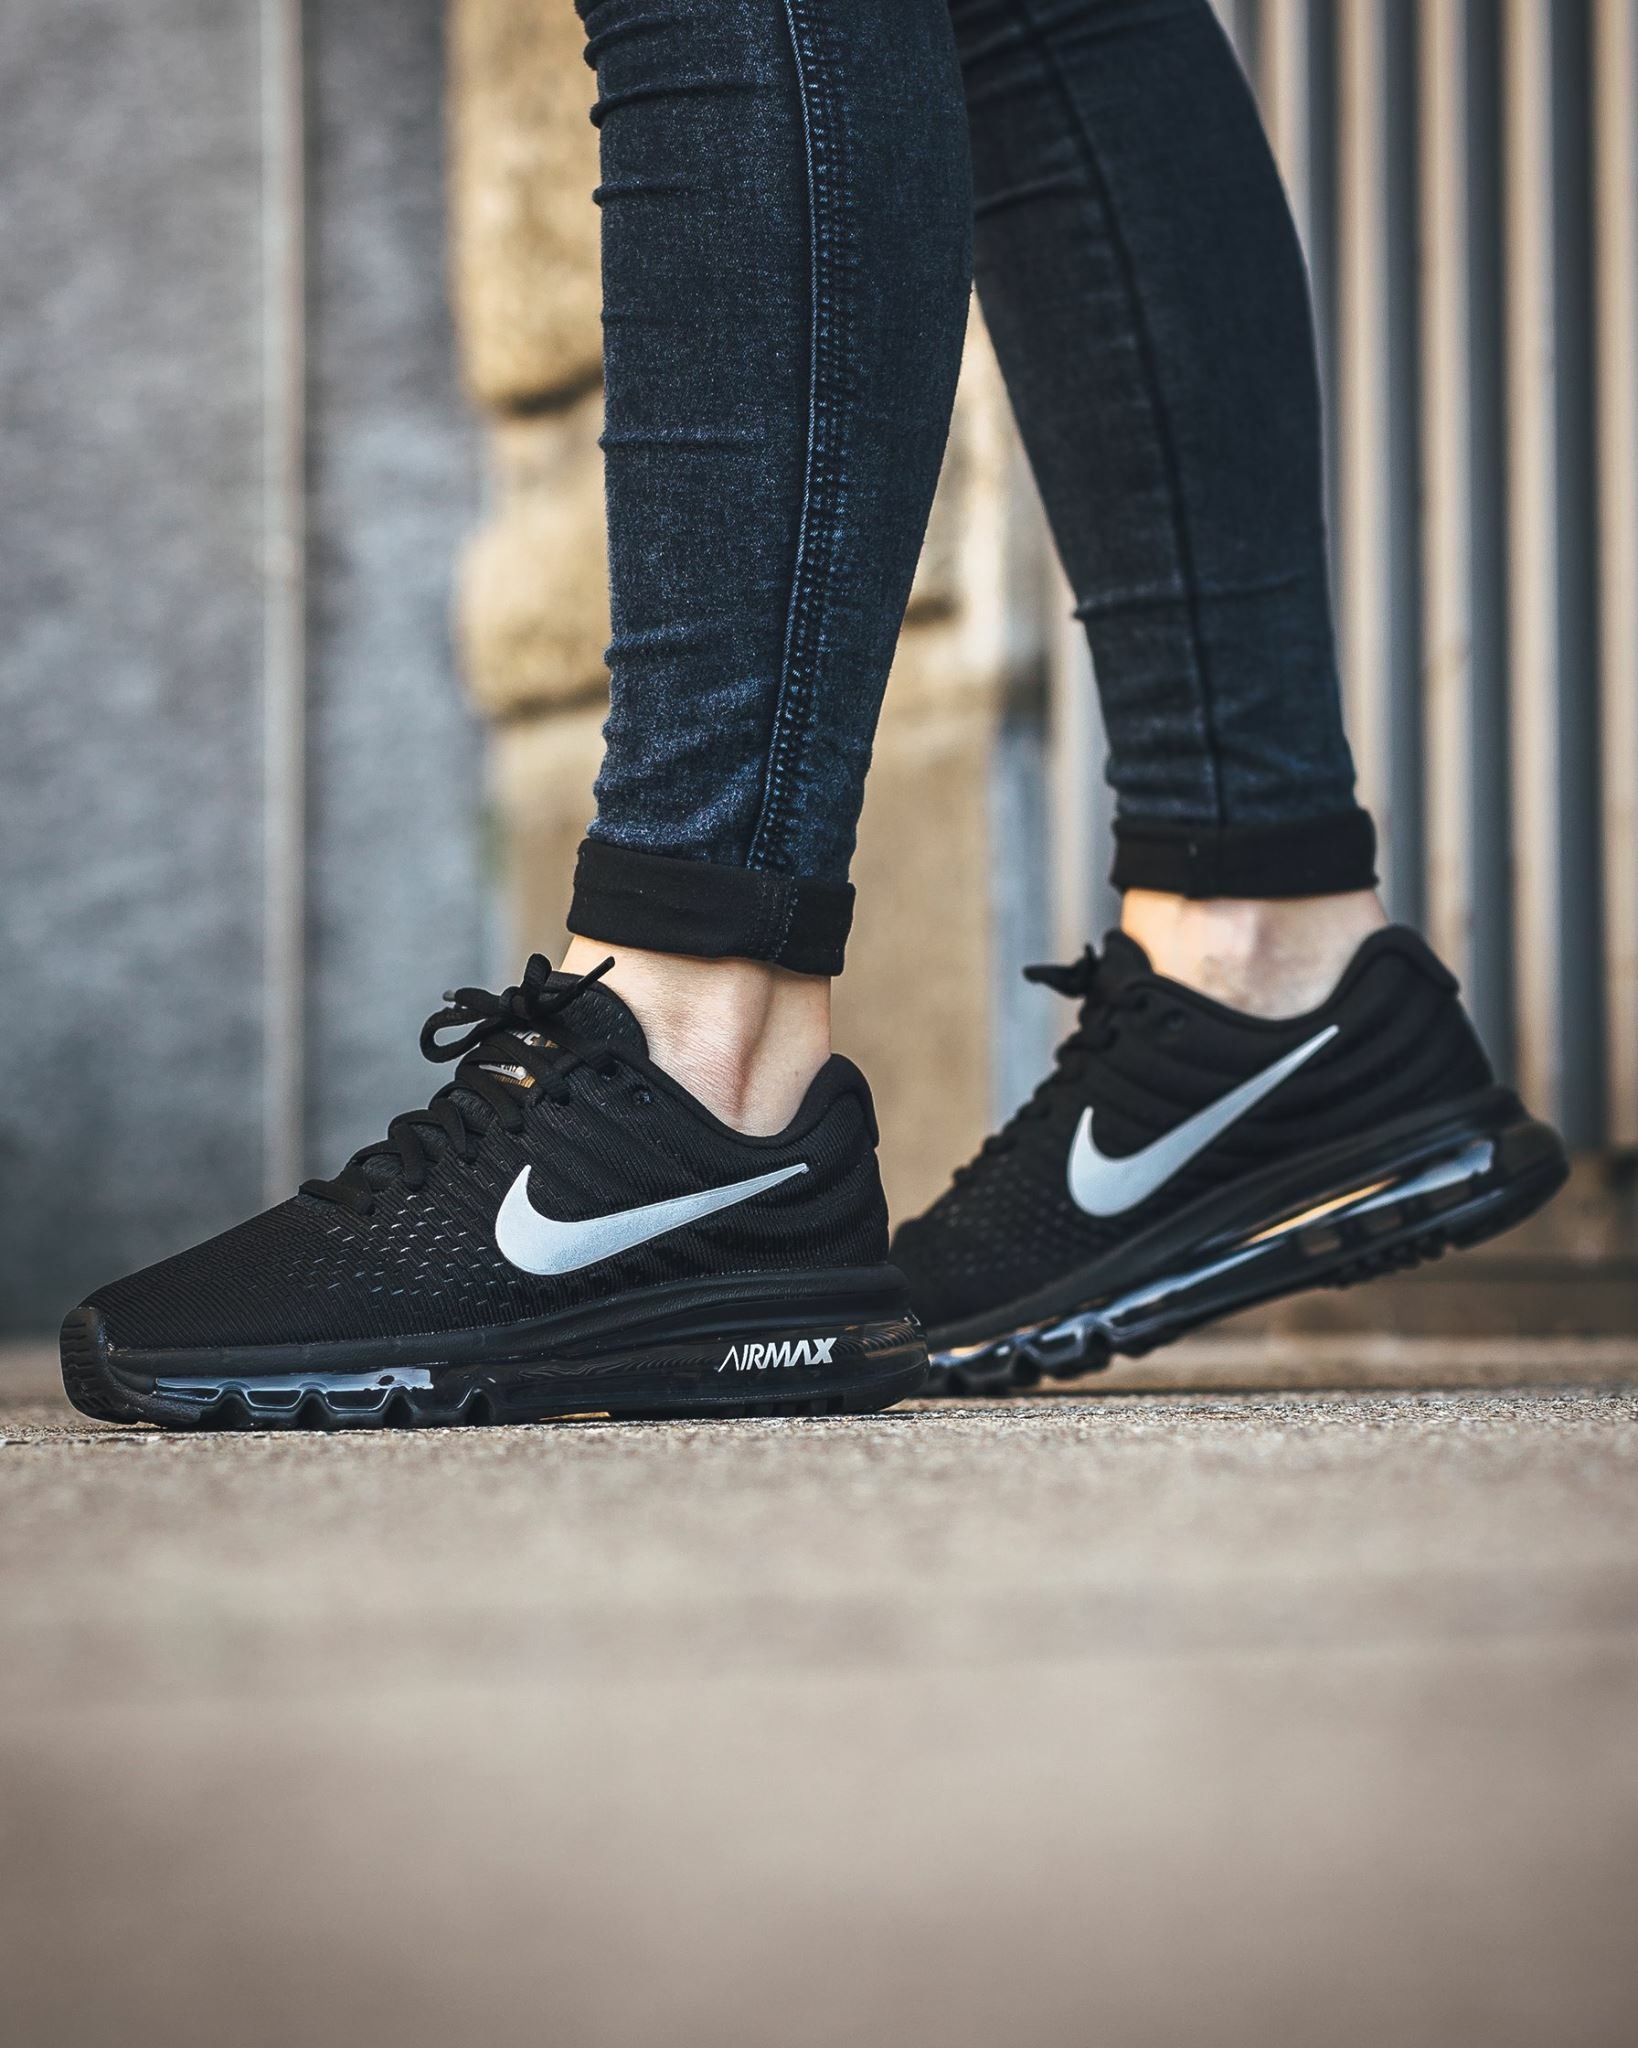 Nike Air Max 2017 | jarami sport 2 en 2019 | Modelos de